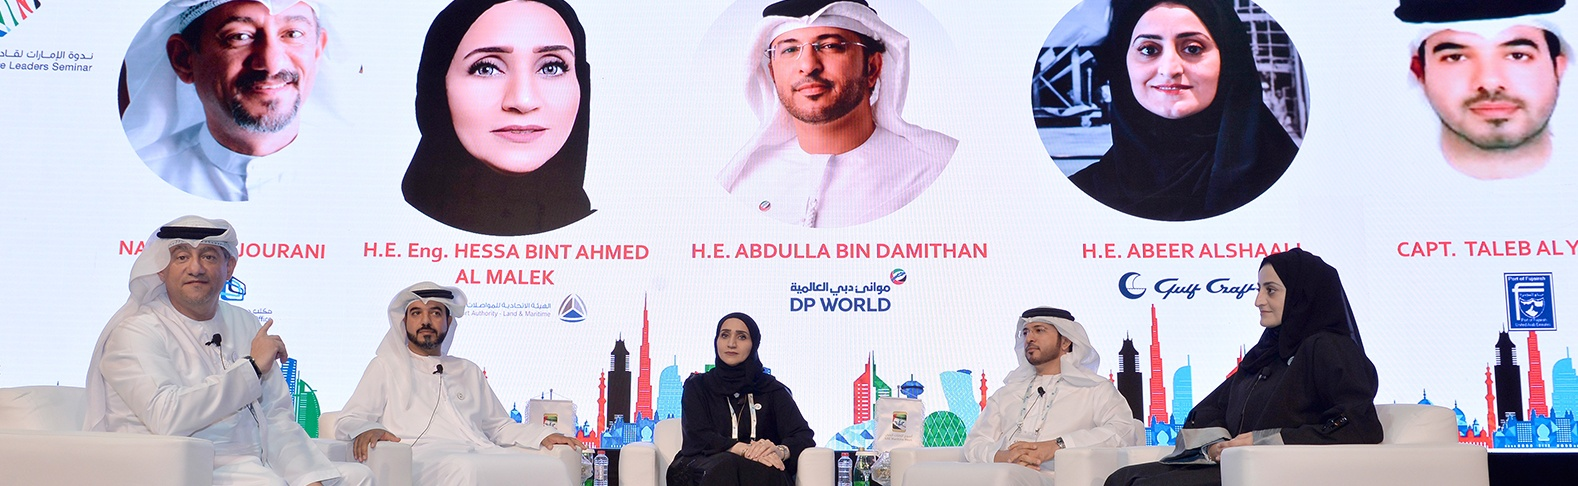 Dubai-Maritime-Week-2018,-Abeer-Alshaali,-Gulf-Craft-3